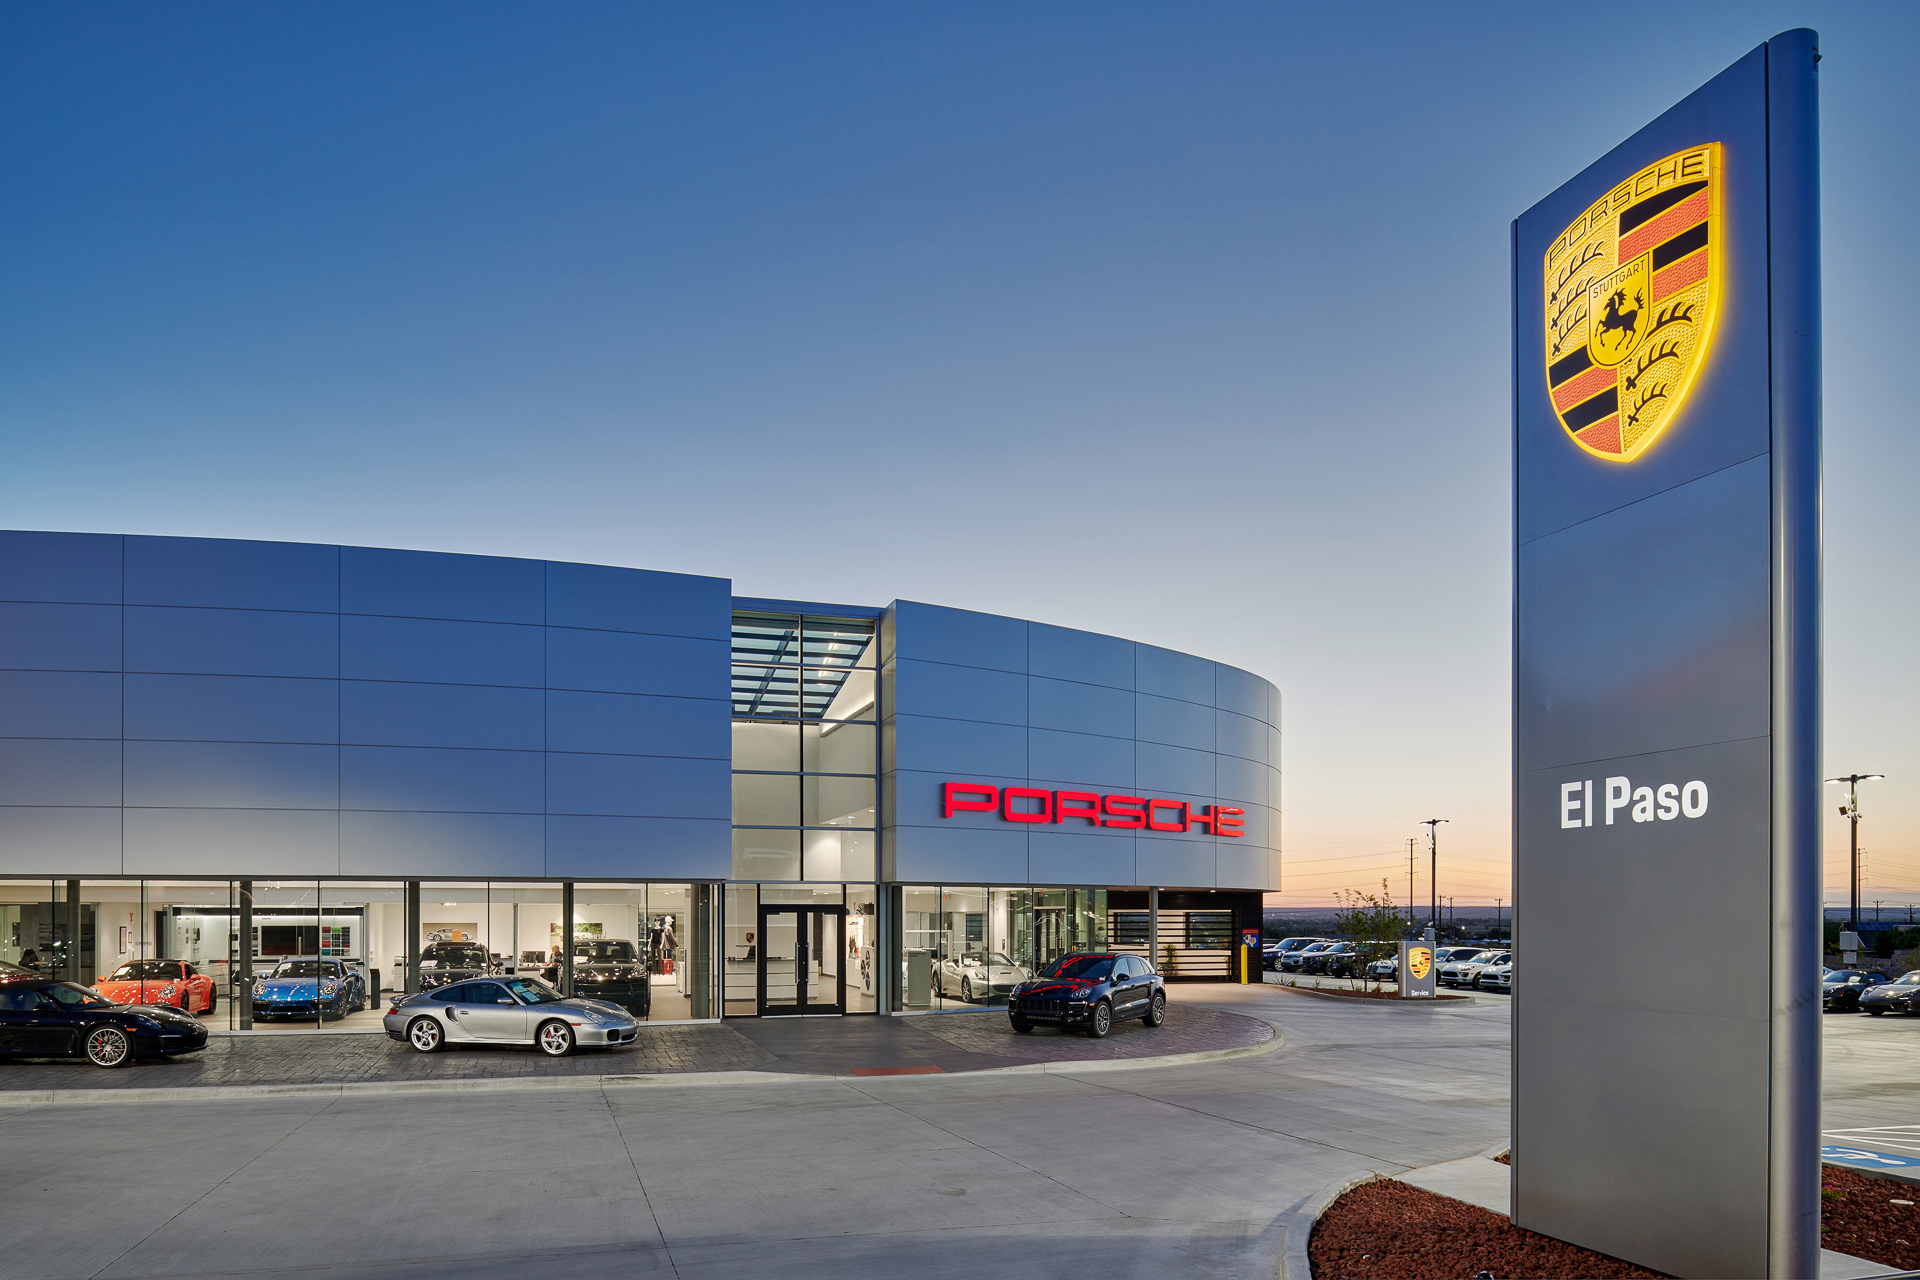 exterior architectural photography of porsche dealership